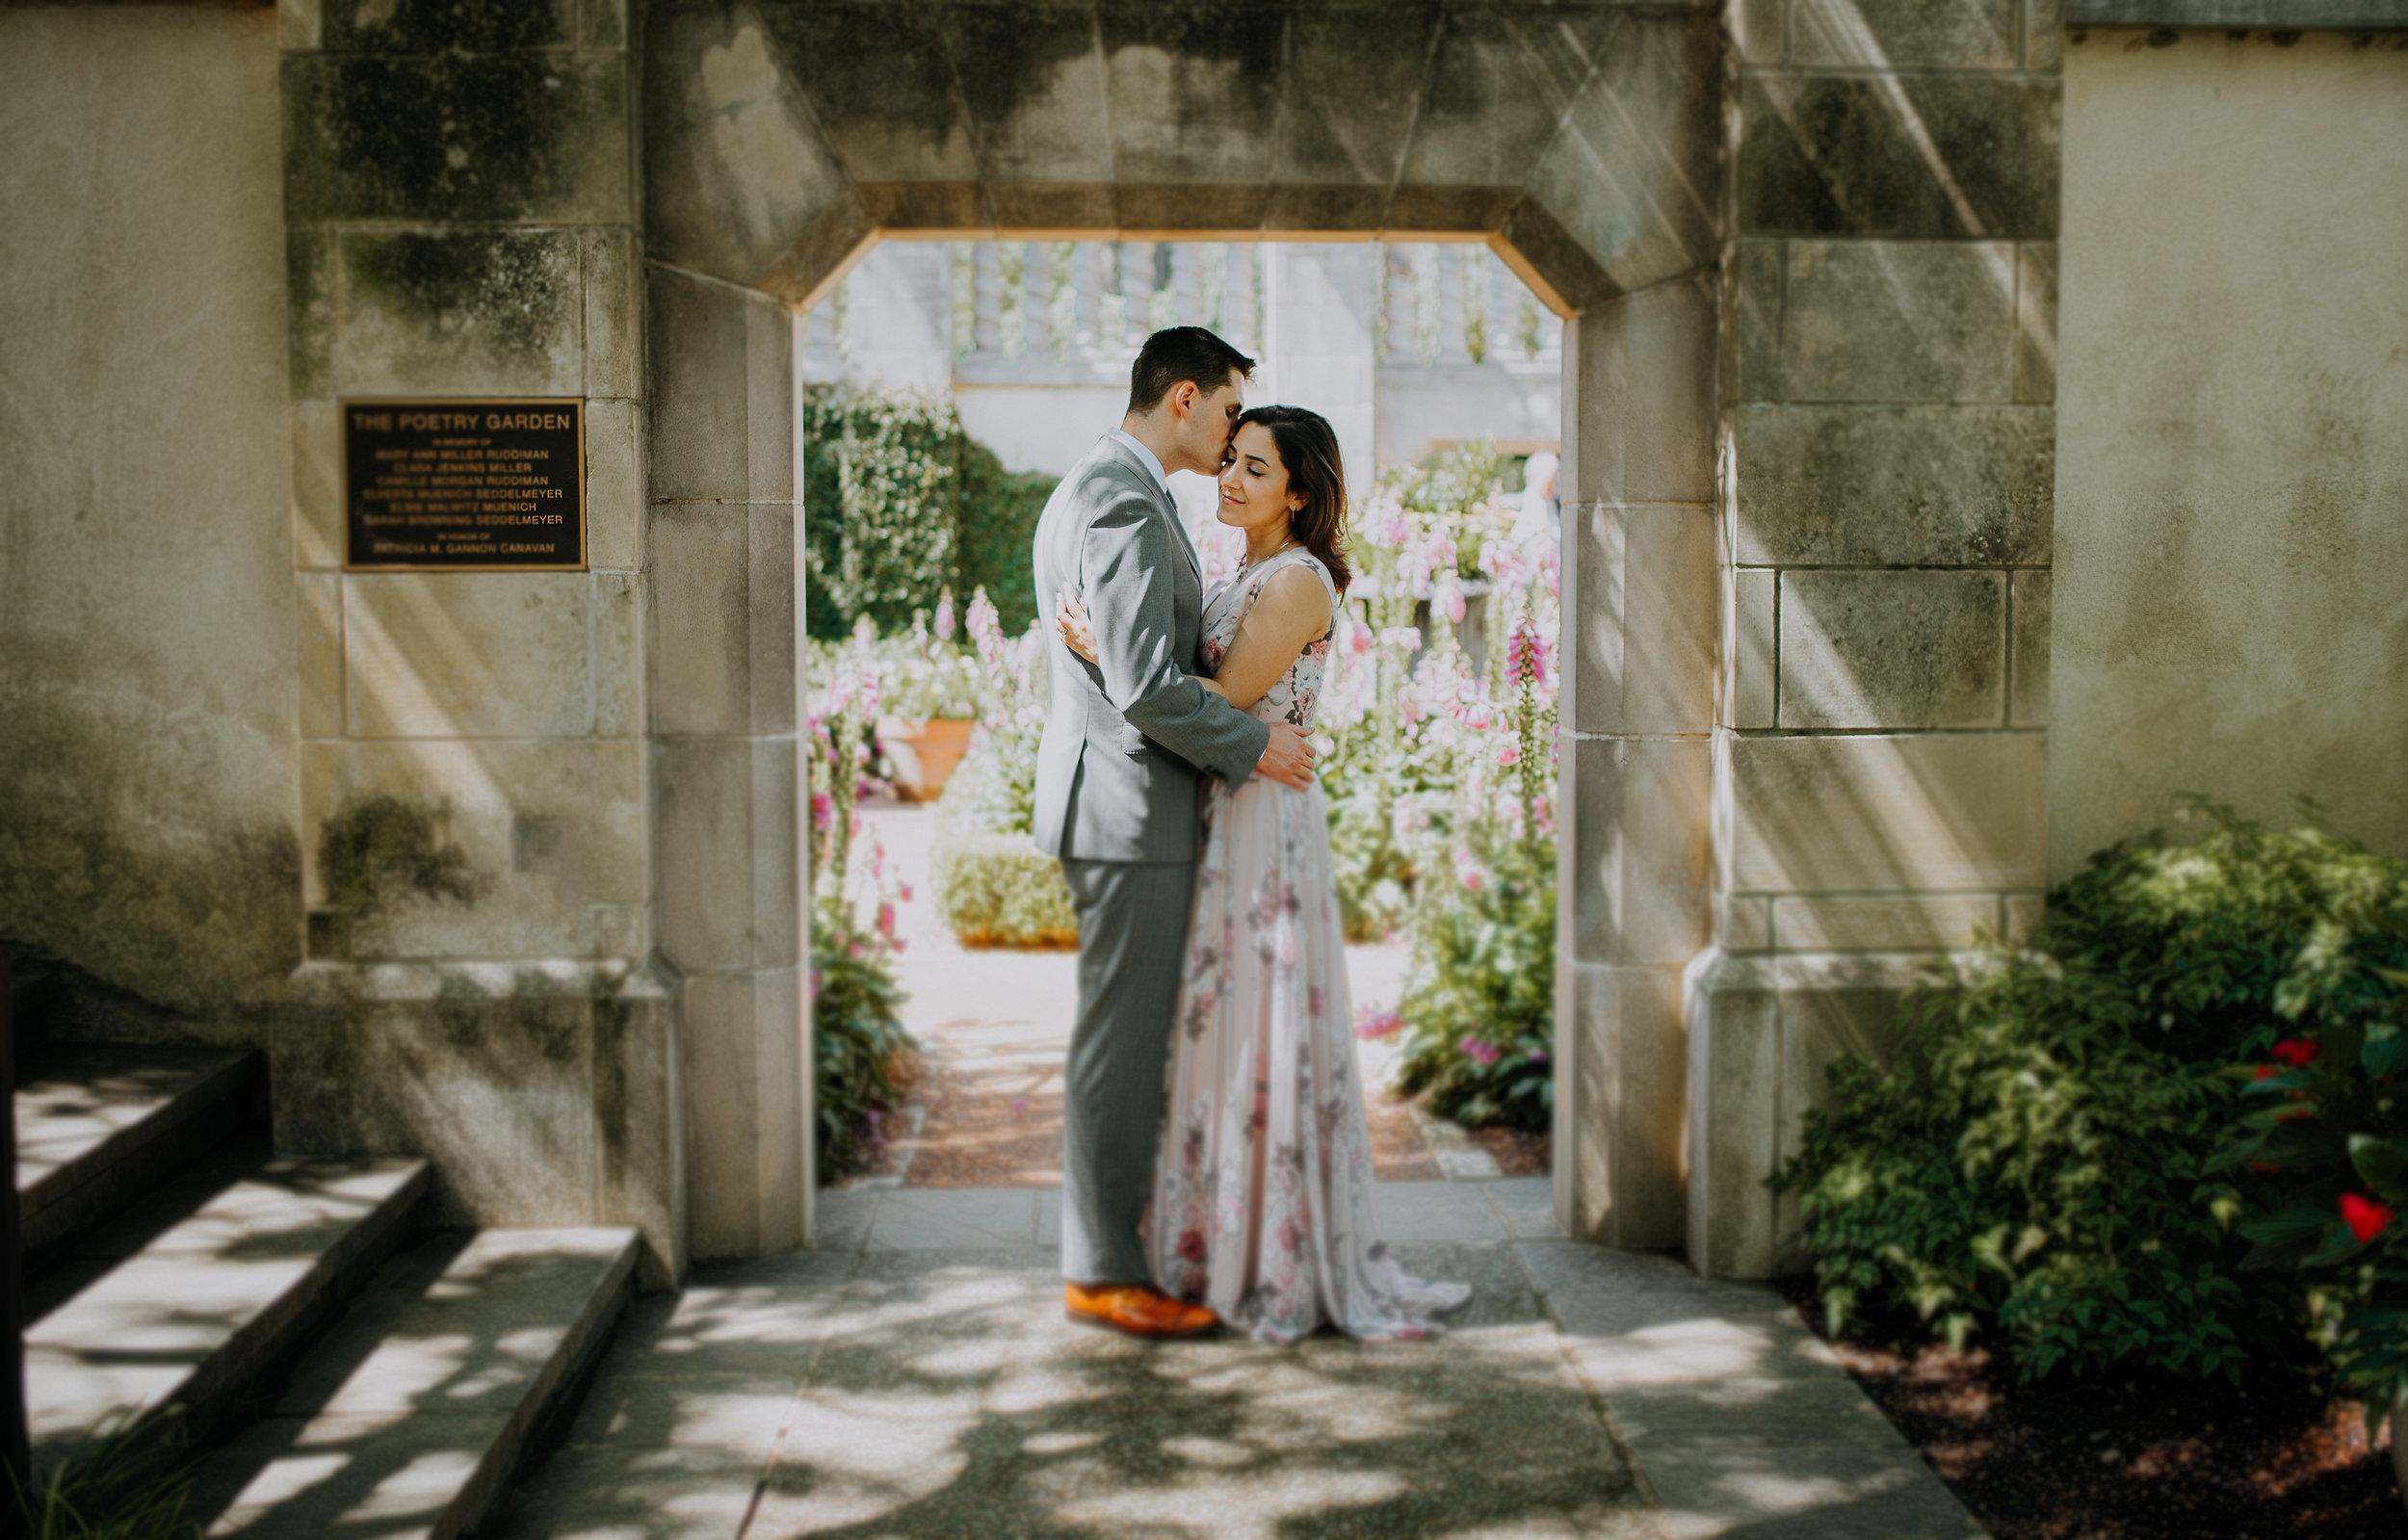 Dallas-fort-worth-wedding-photographer-dallas-arboretum-intimate-wedding-dallas-texas-18